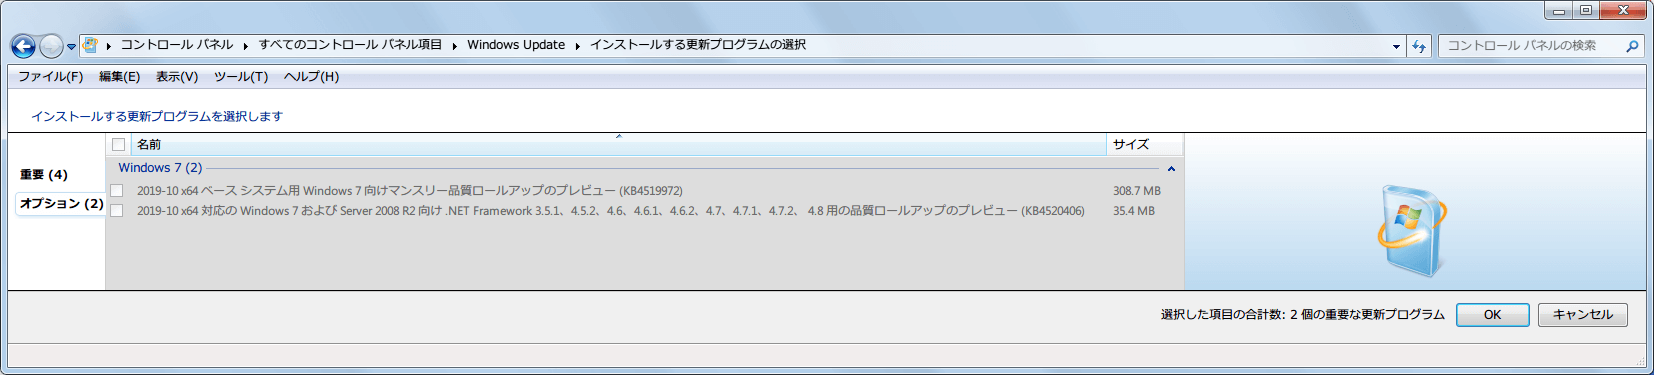 Windows 7 64bit Windows Update オプション 2019年10月分リスト KB4519972、KB4520406 非表示